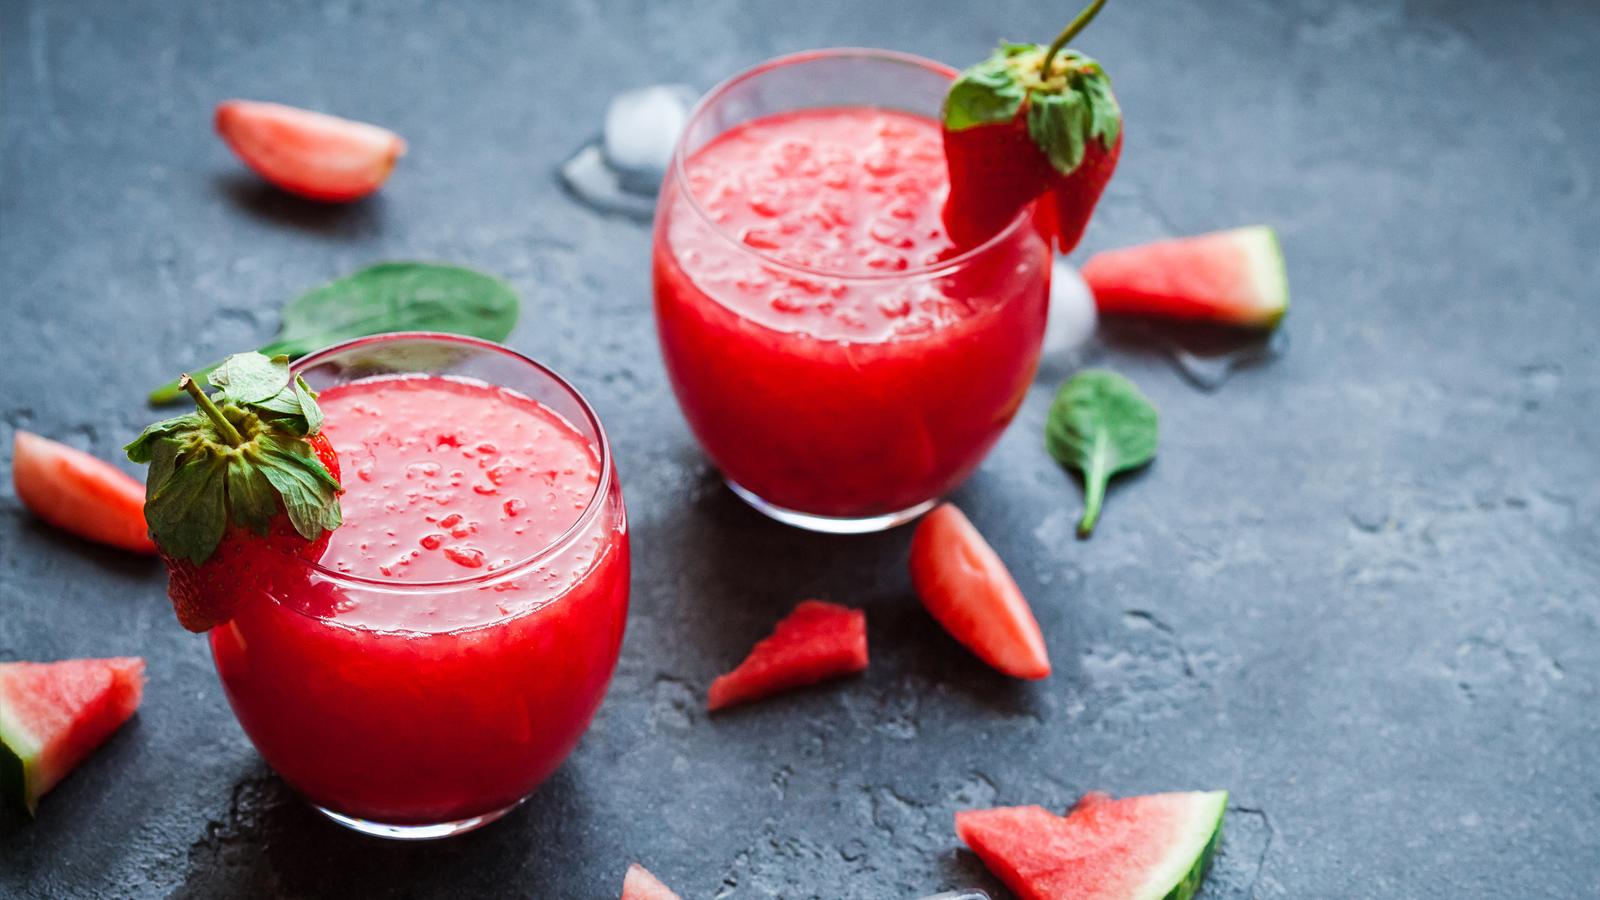 Strawberry daquiris